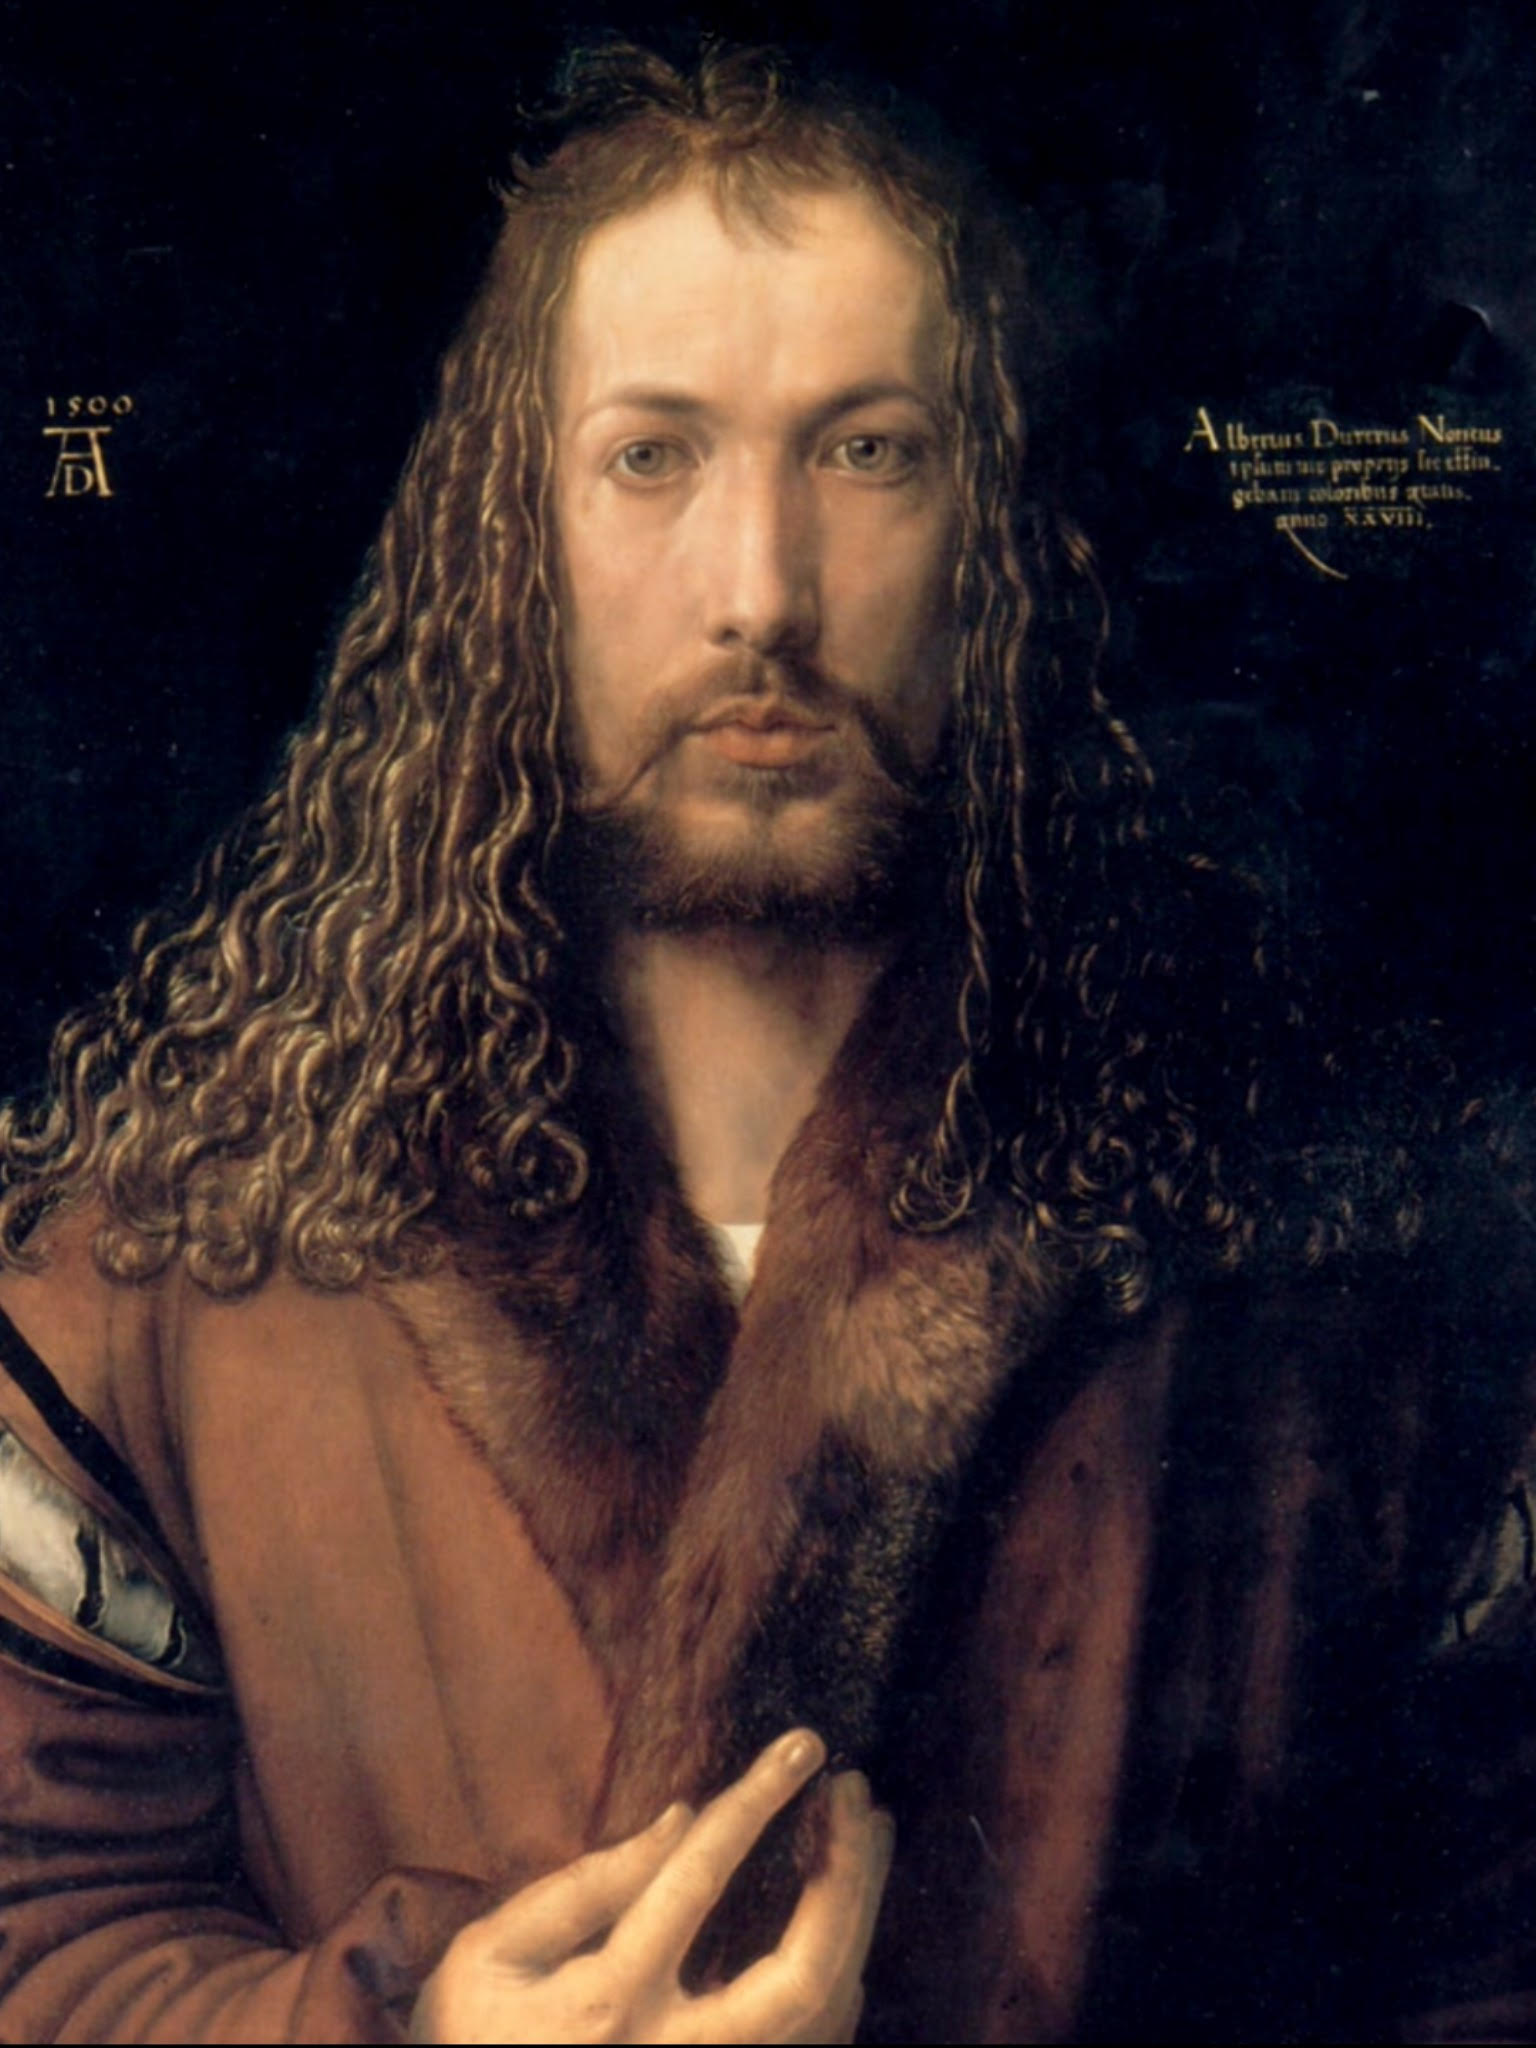 Albrecht Dürer: The Man Behind the Self-Portrait - Lutheran Reformation